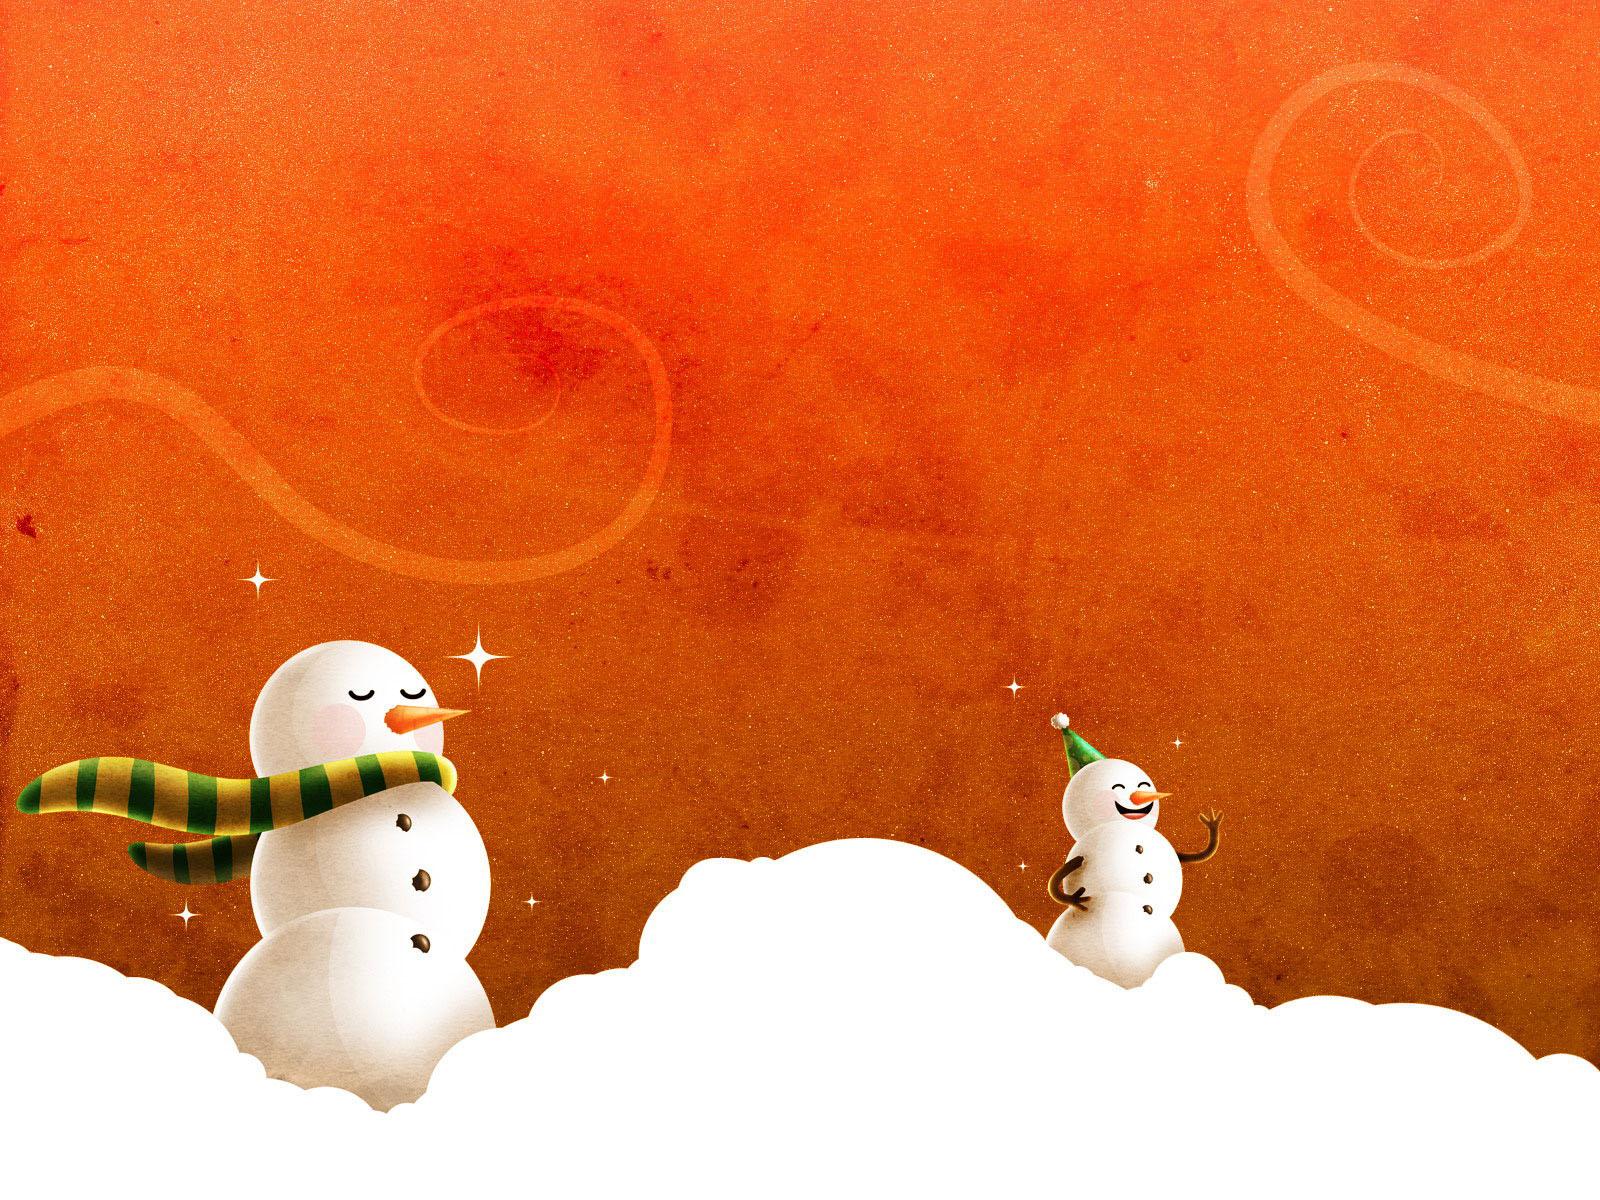 snowman desktop background - photo #11